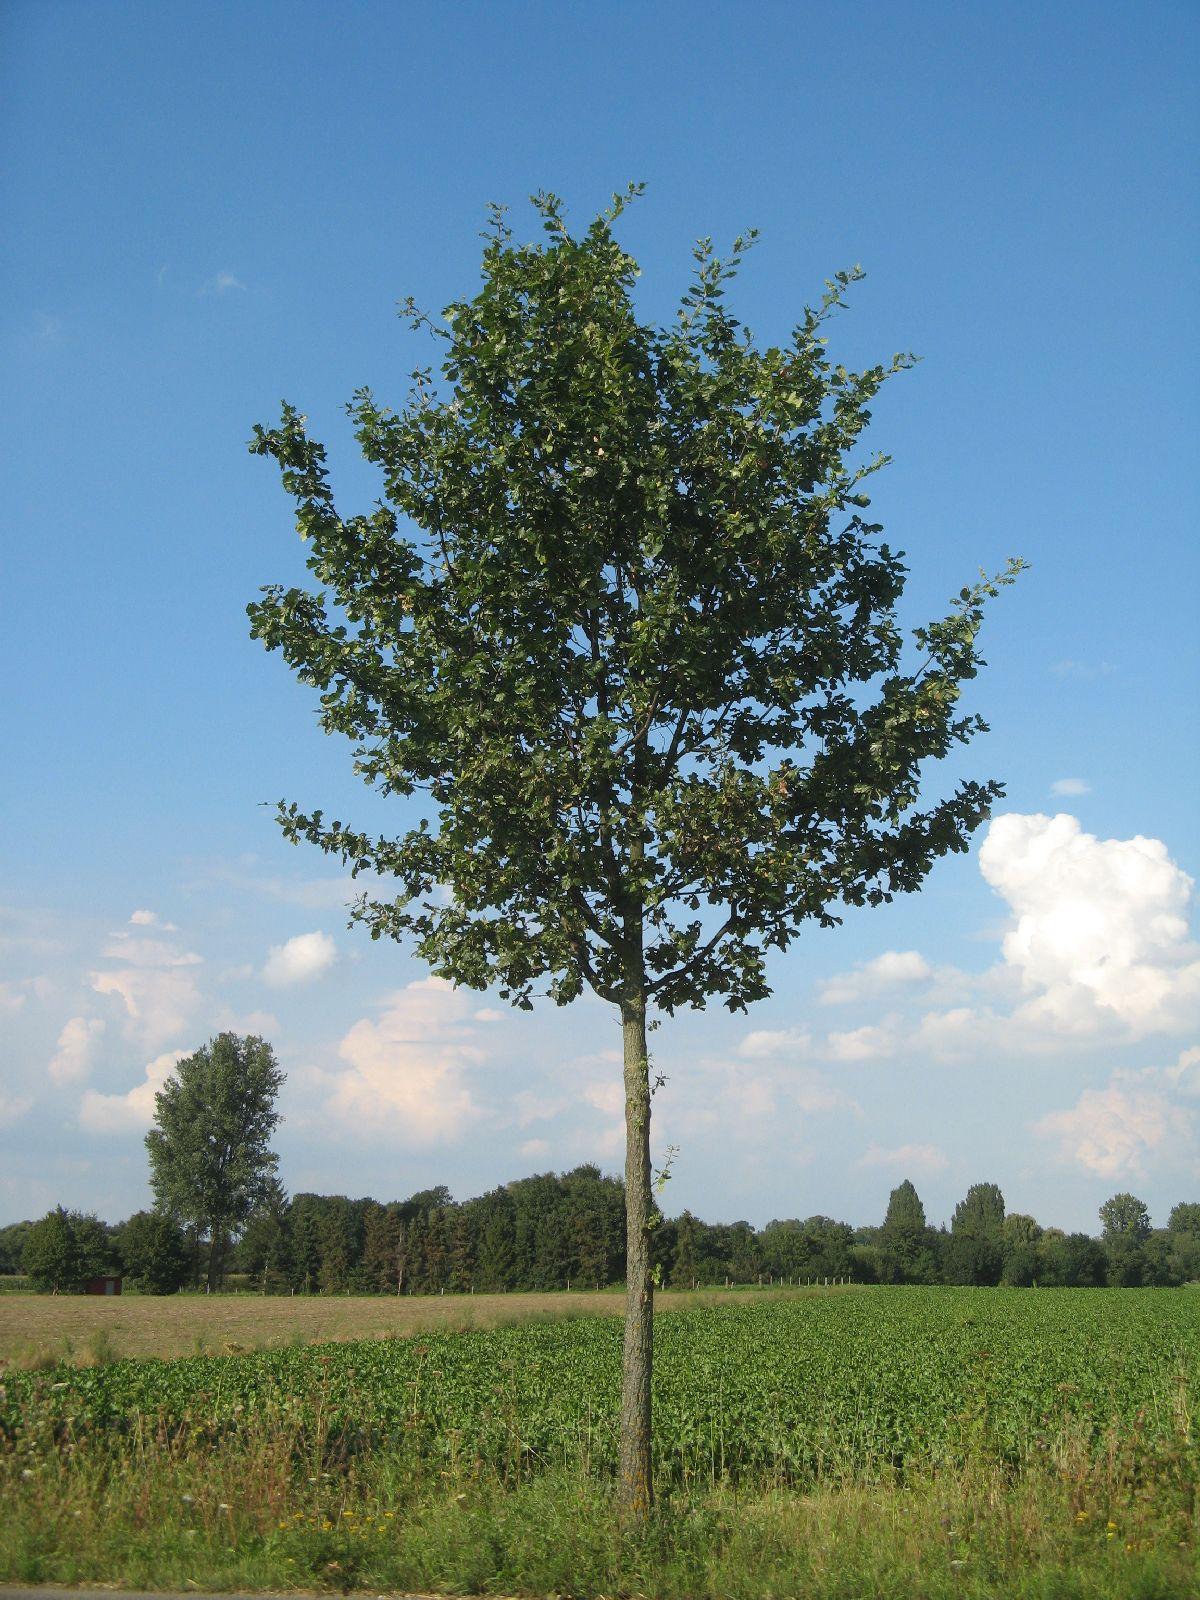 Plants-Trees_Photo_Texture_B_26970